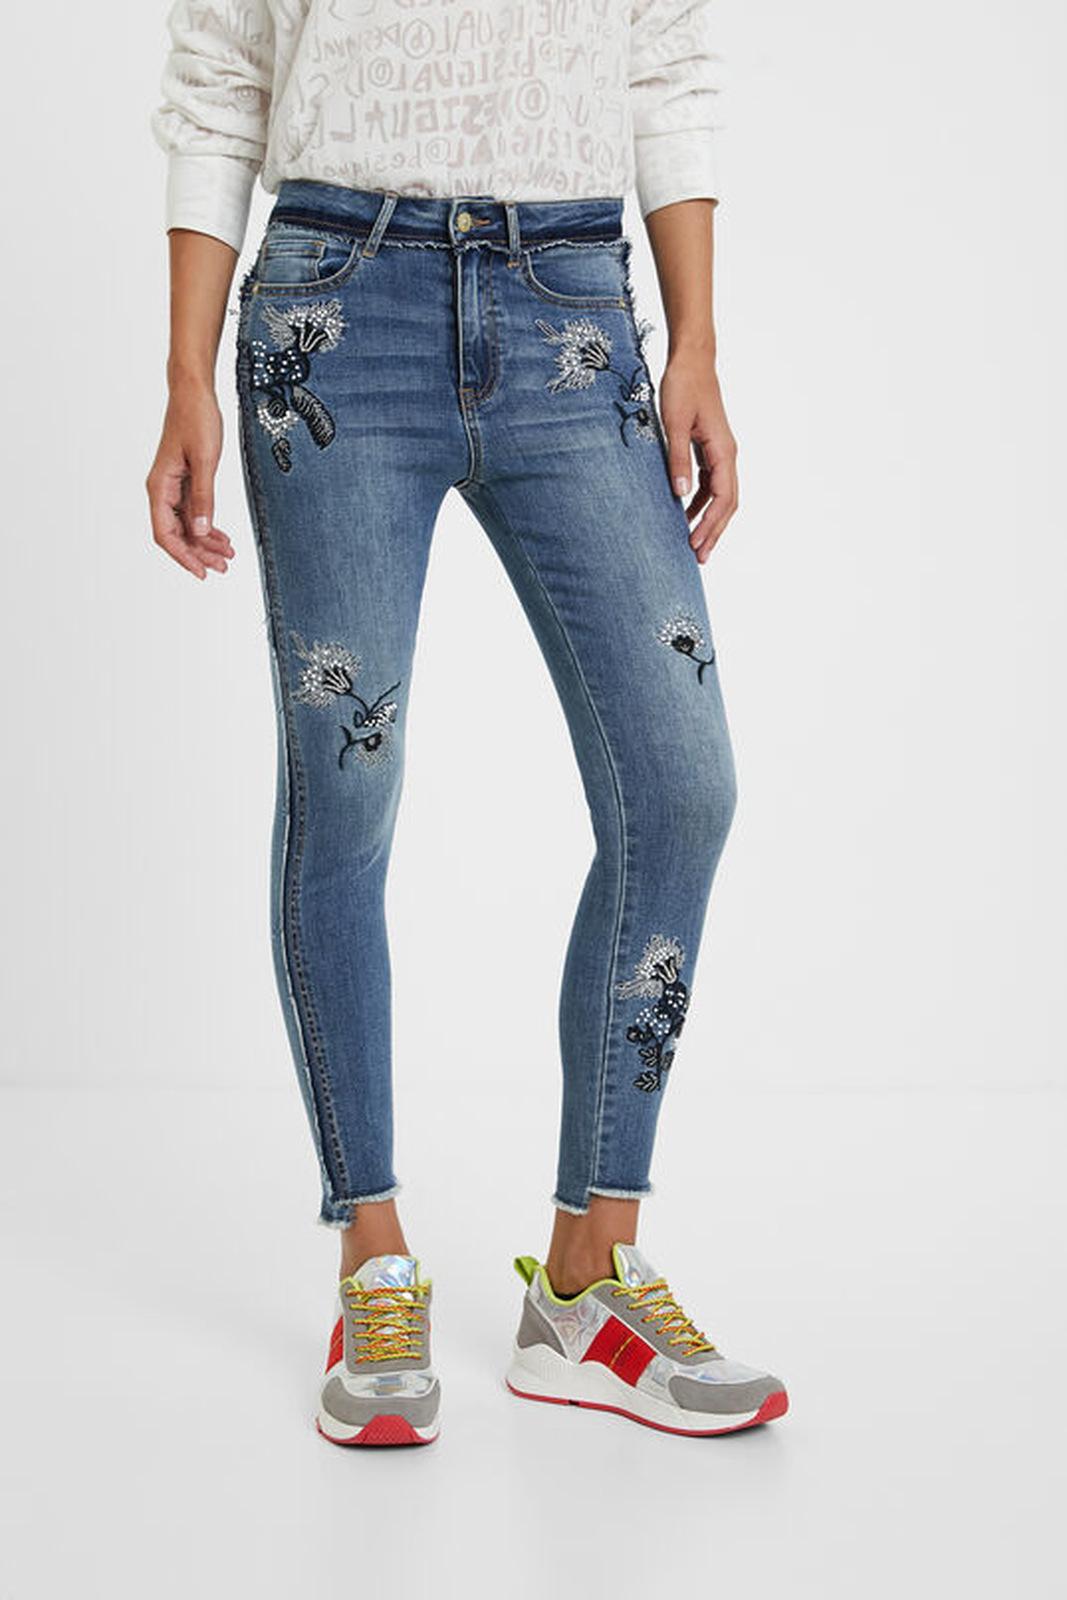 Desigual modré džíny Denim Miami Flowers